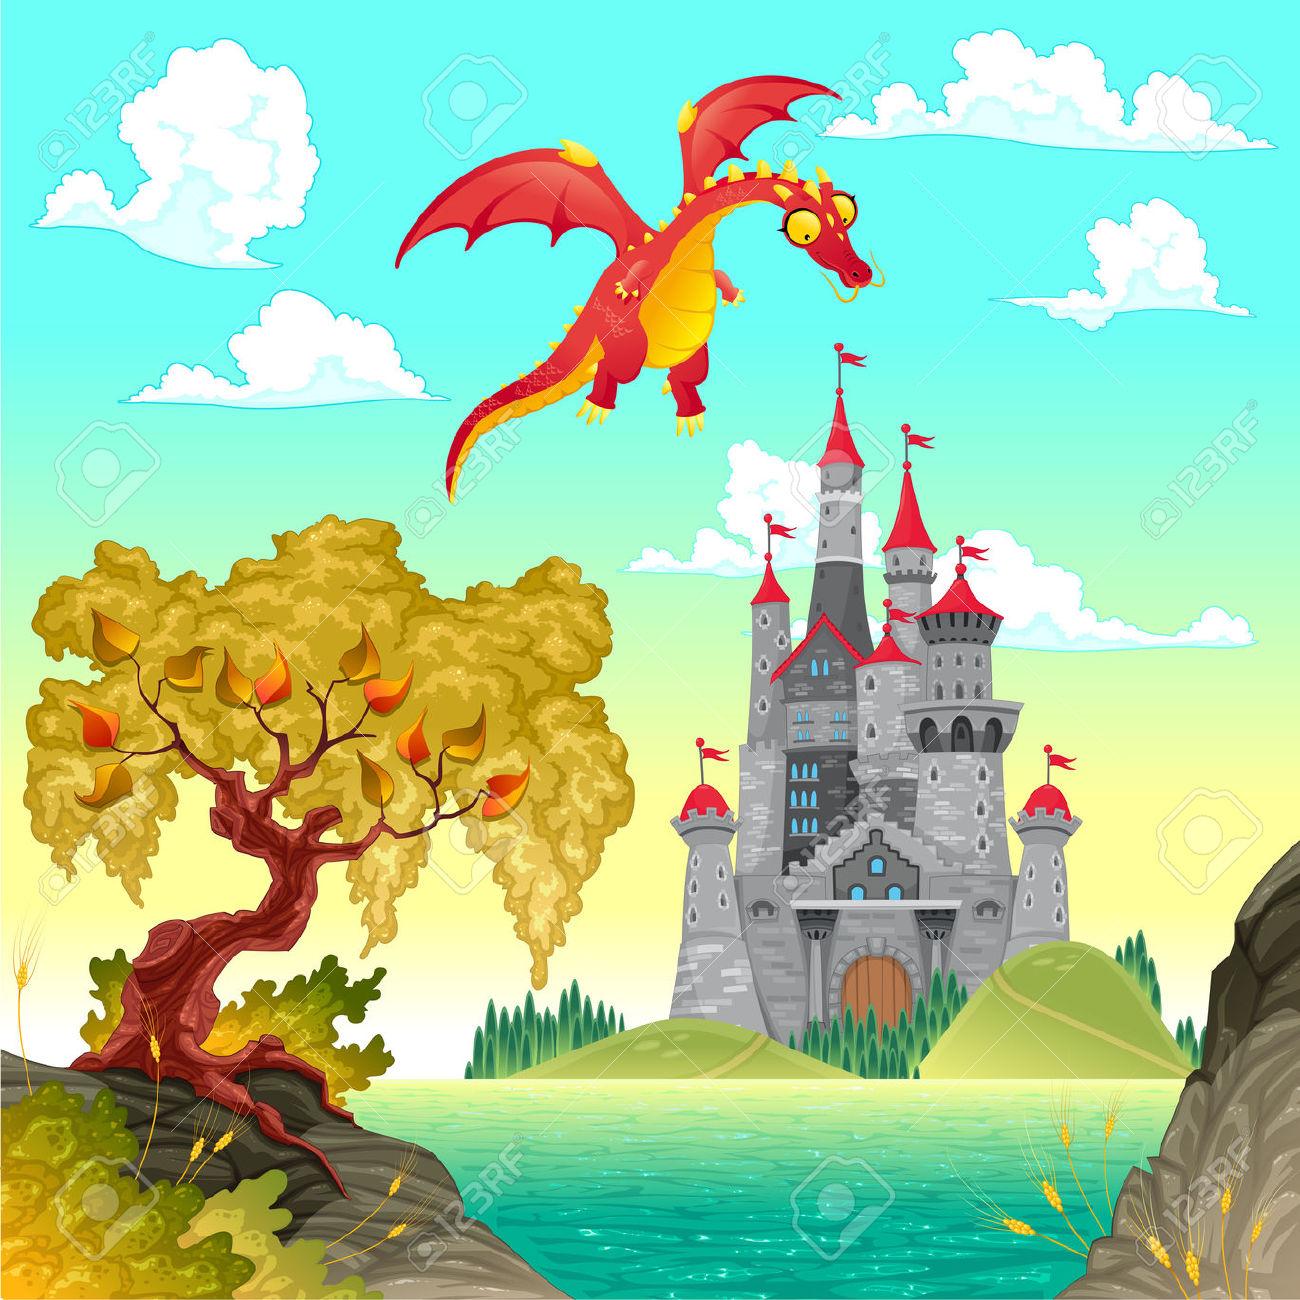 Fantasy world clipart.